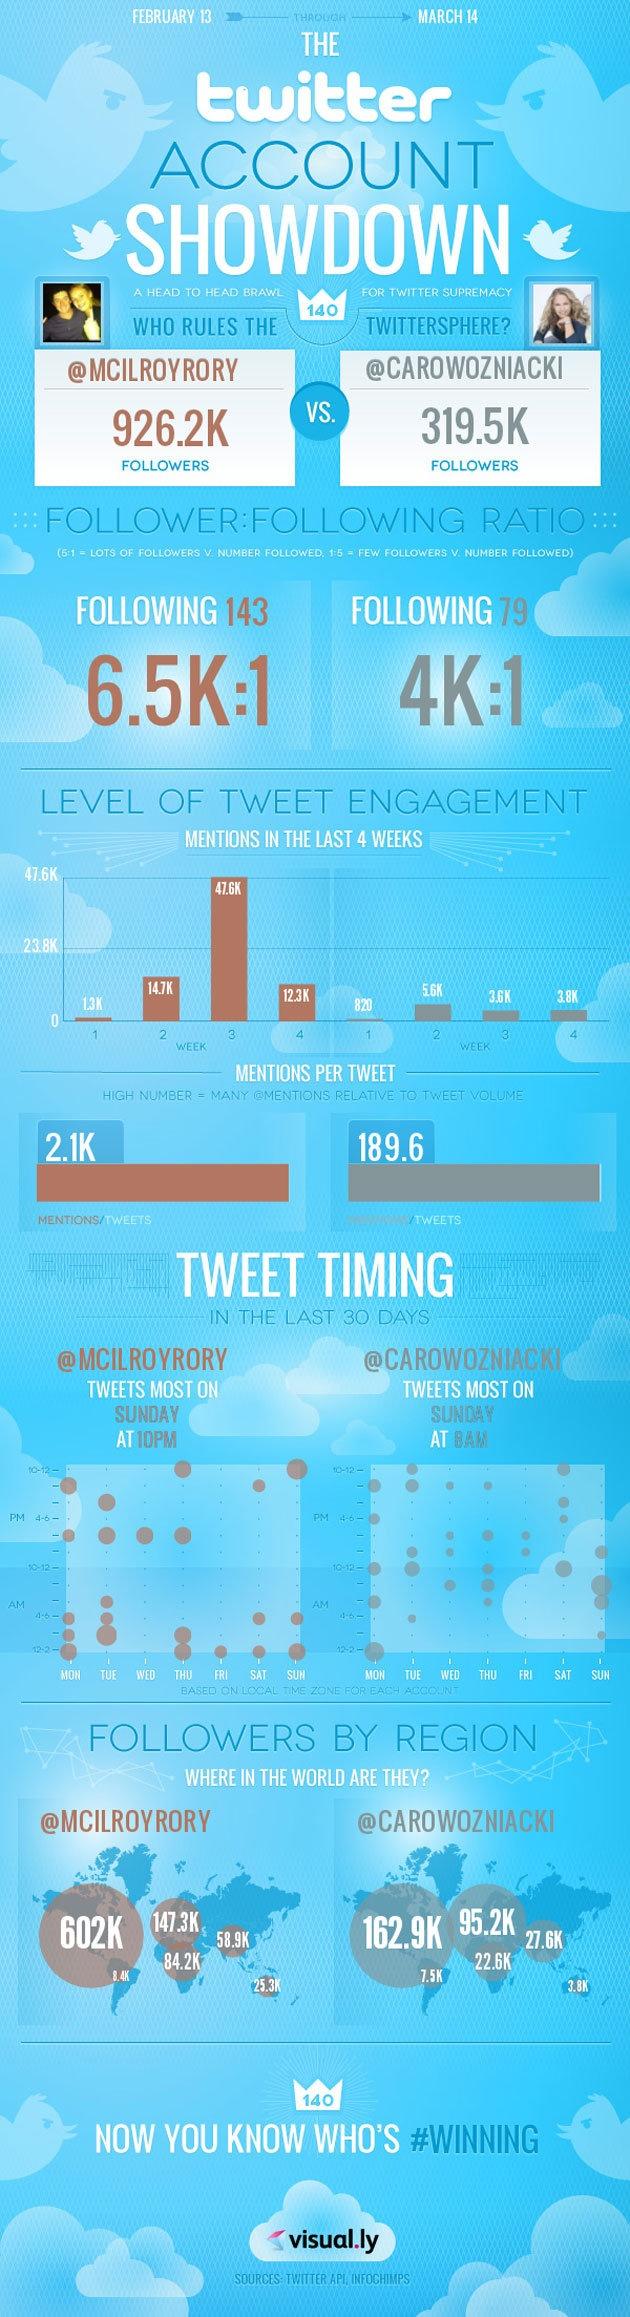 Rory McIlroy and Caroline Wozniacki: Who wins the Twitter war